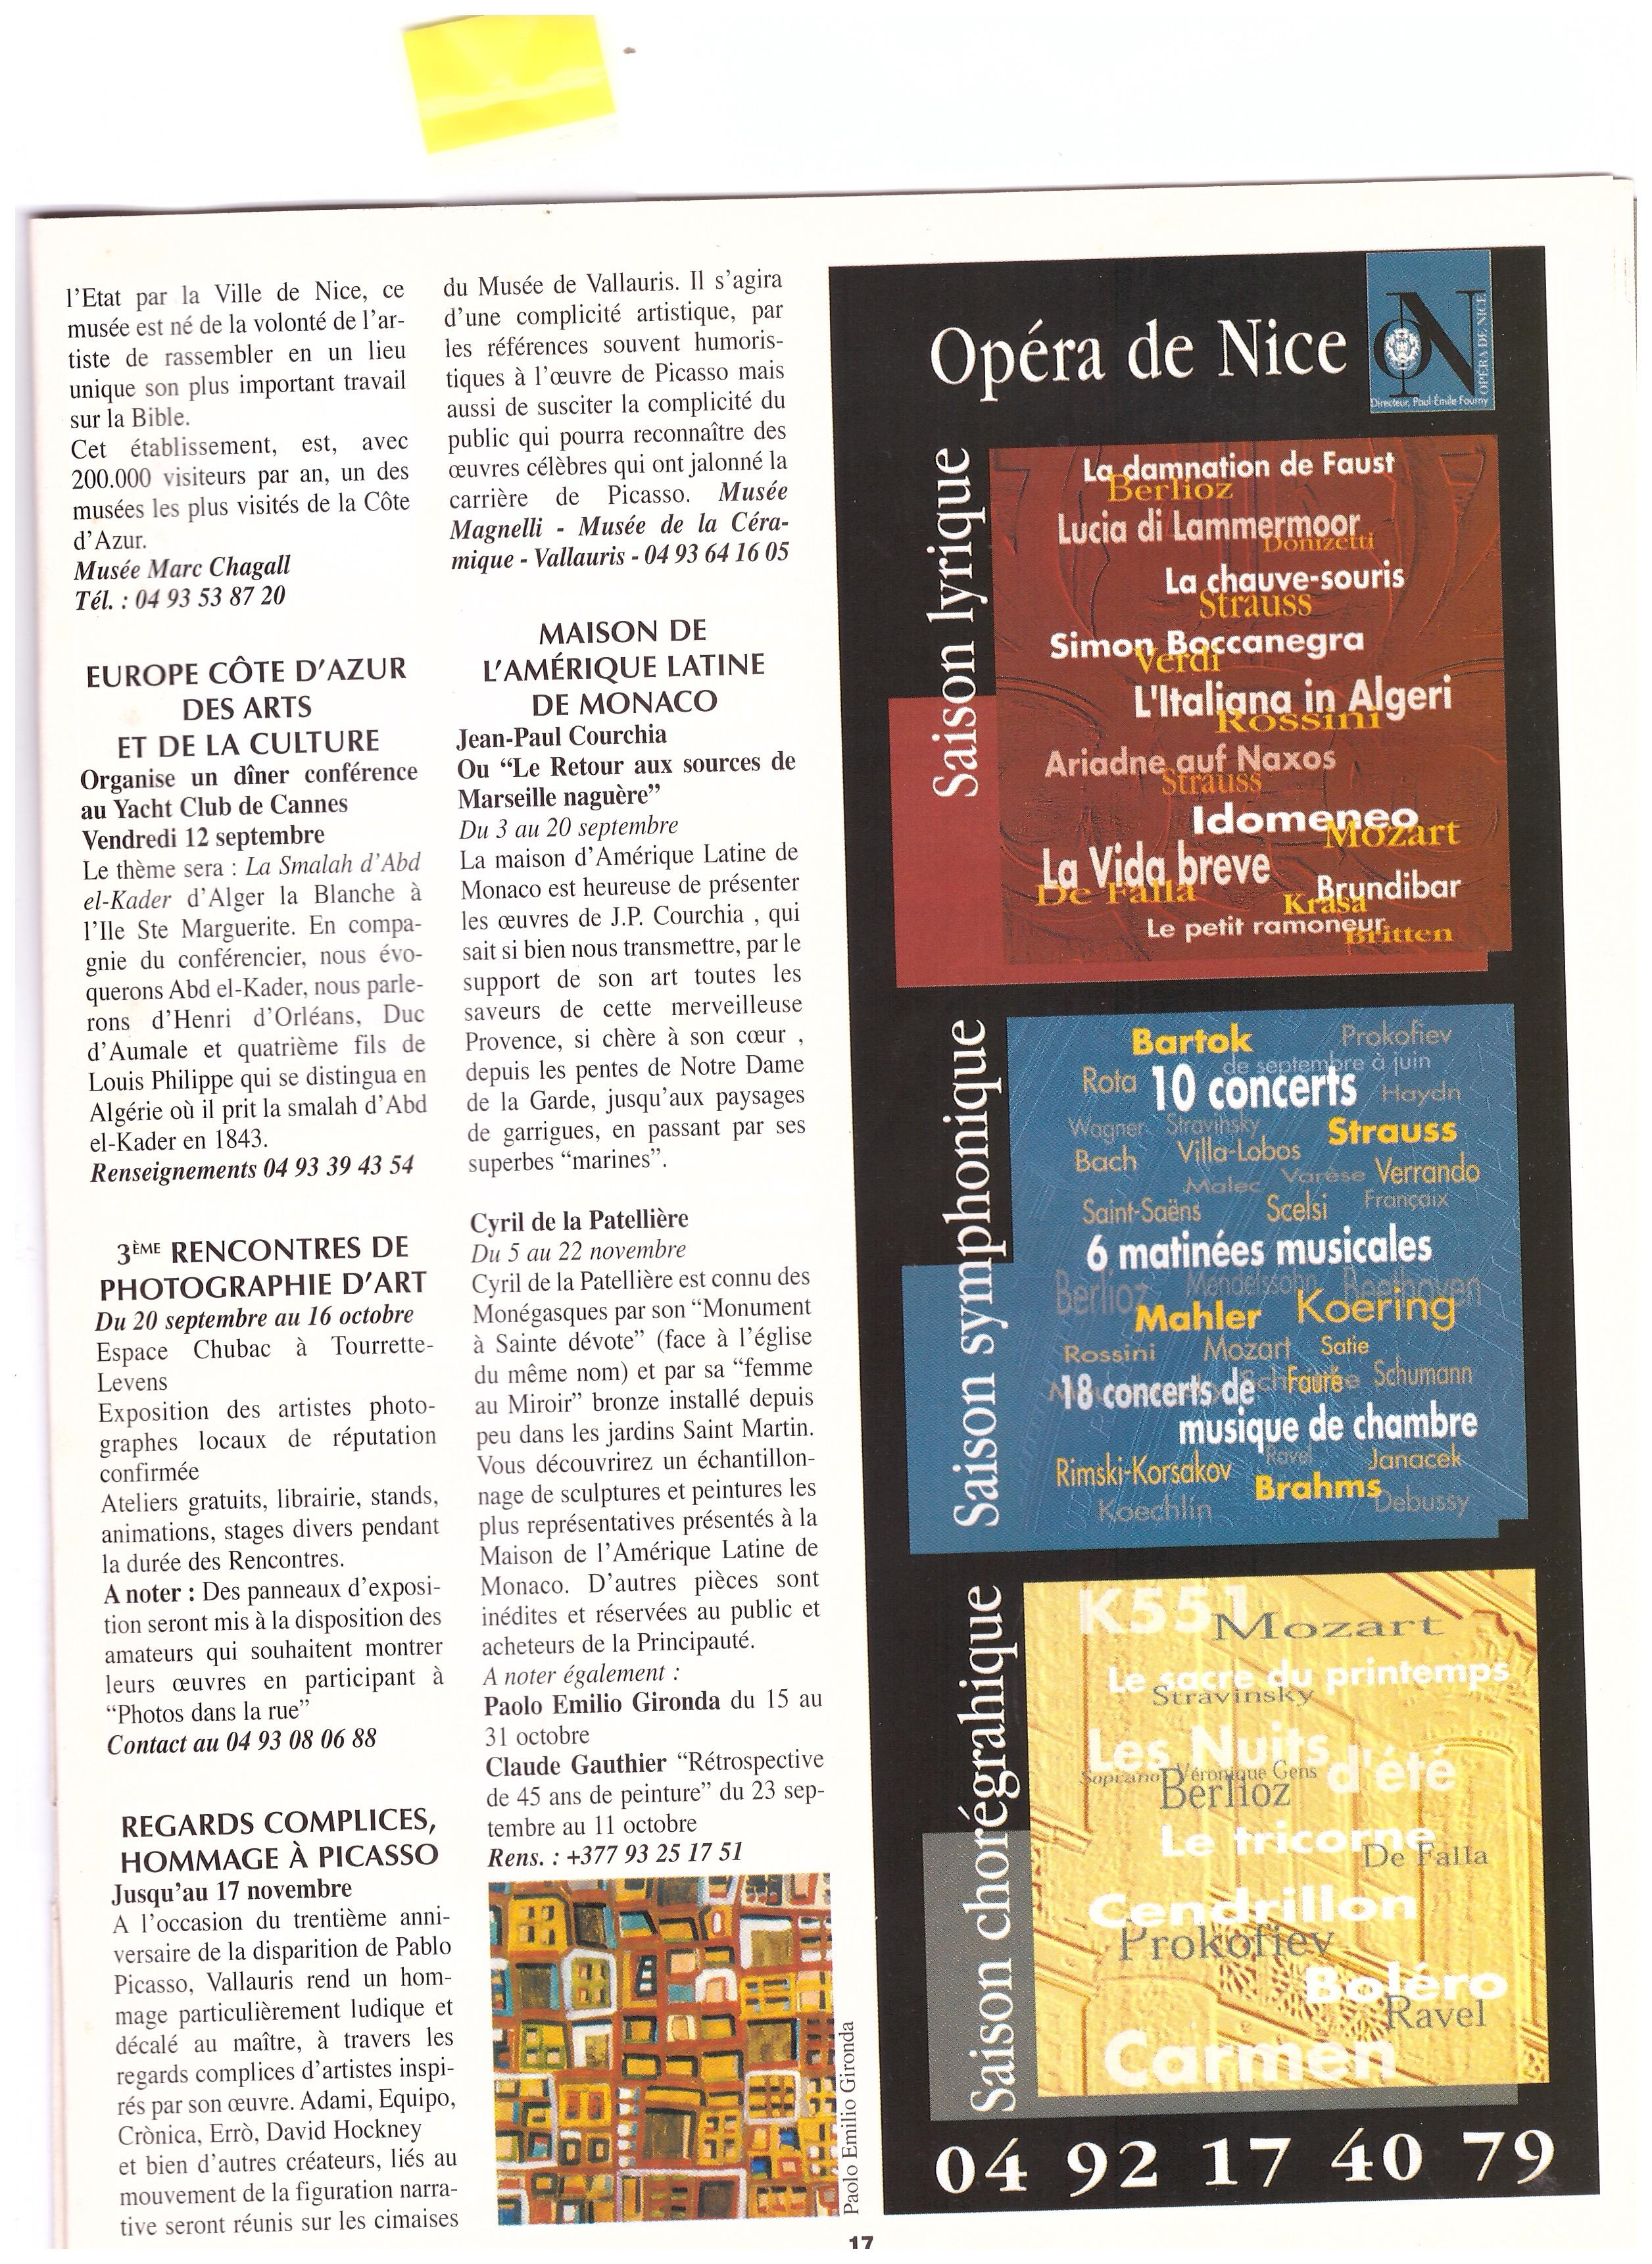 2003 ART EXPO MONACO